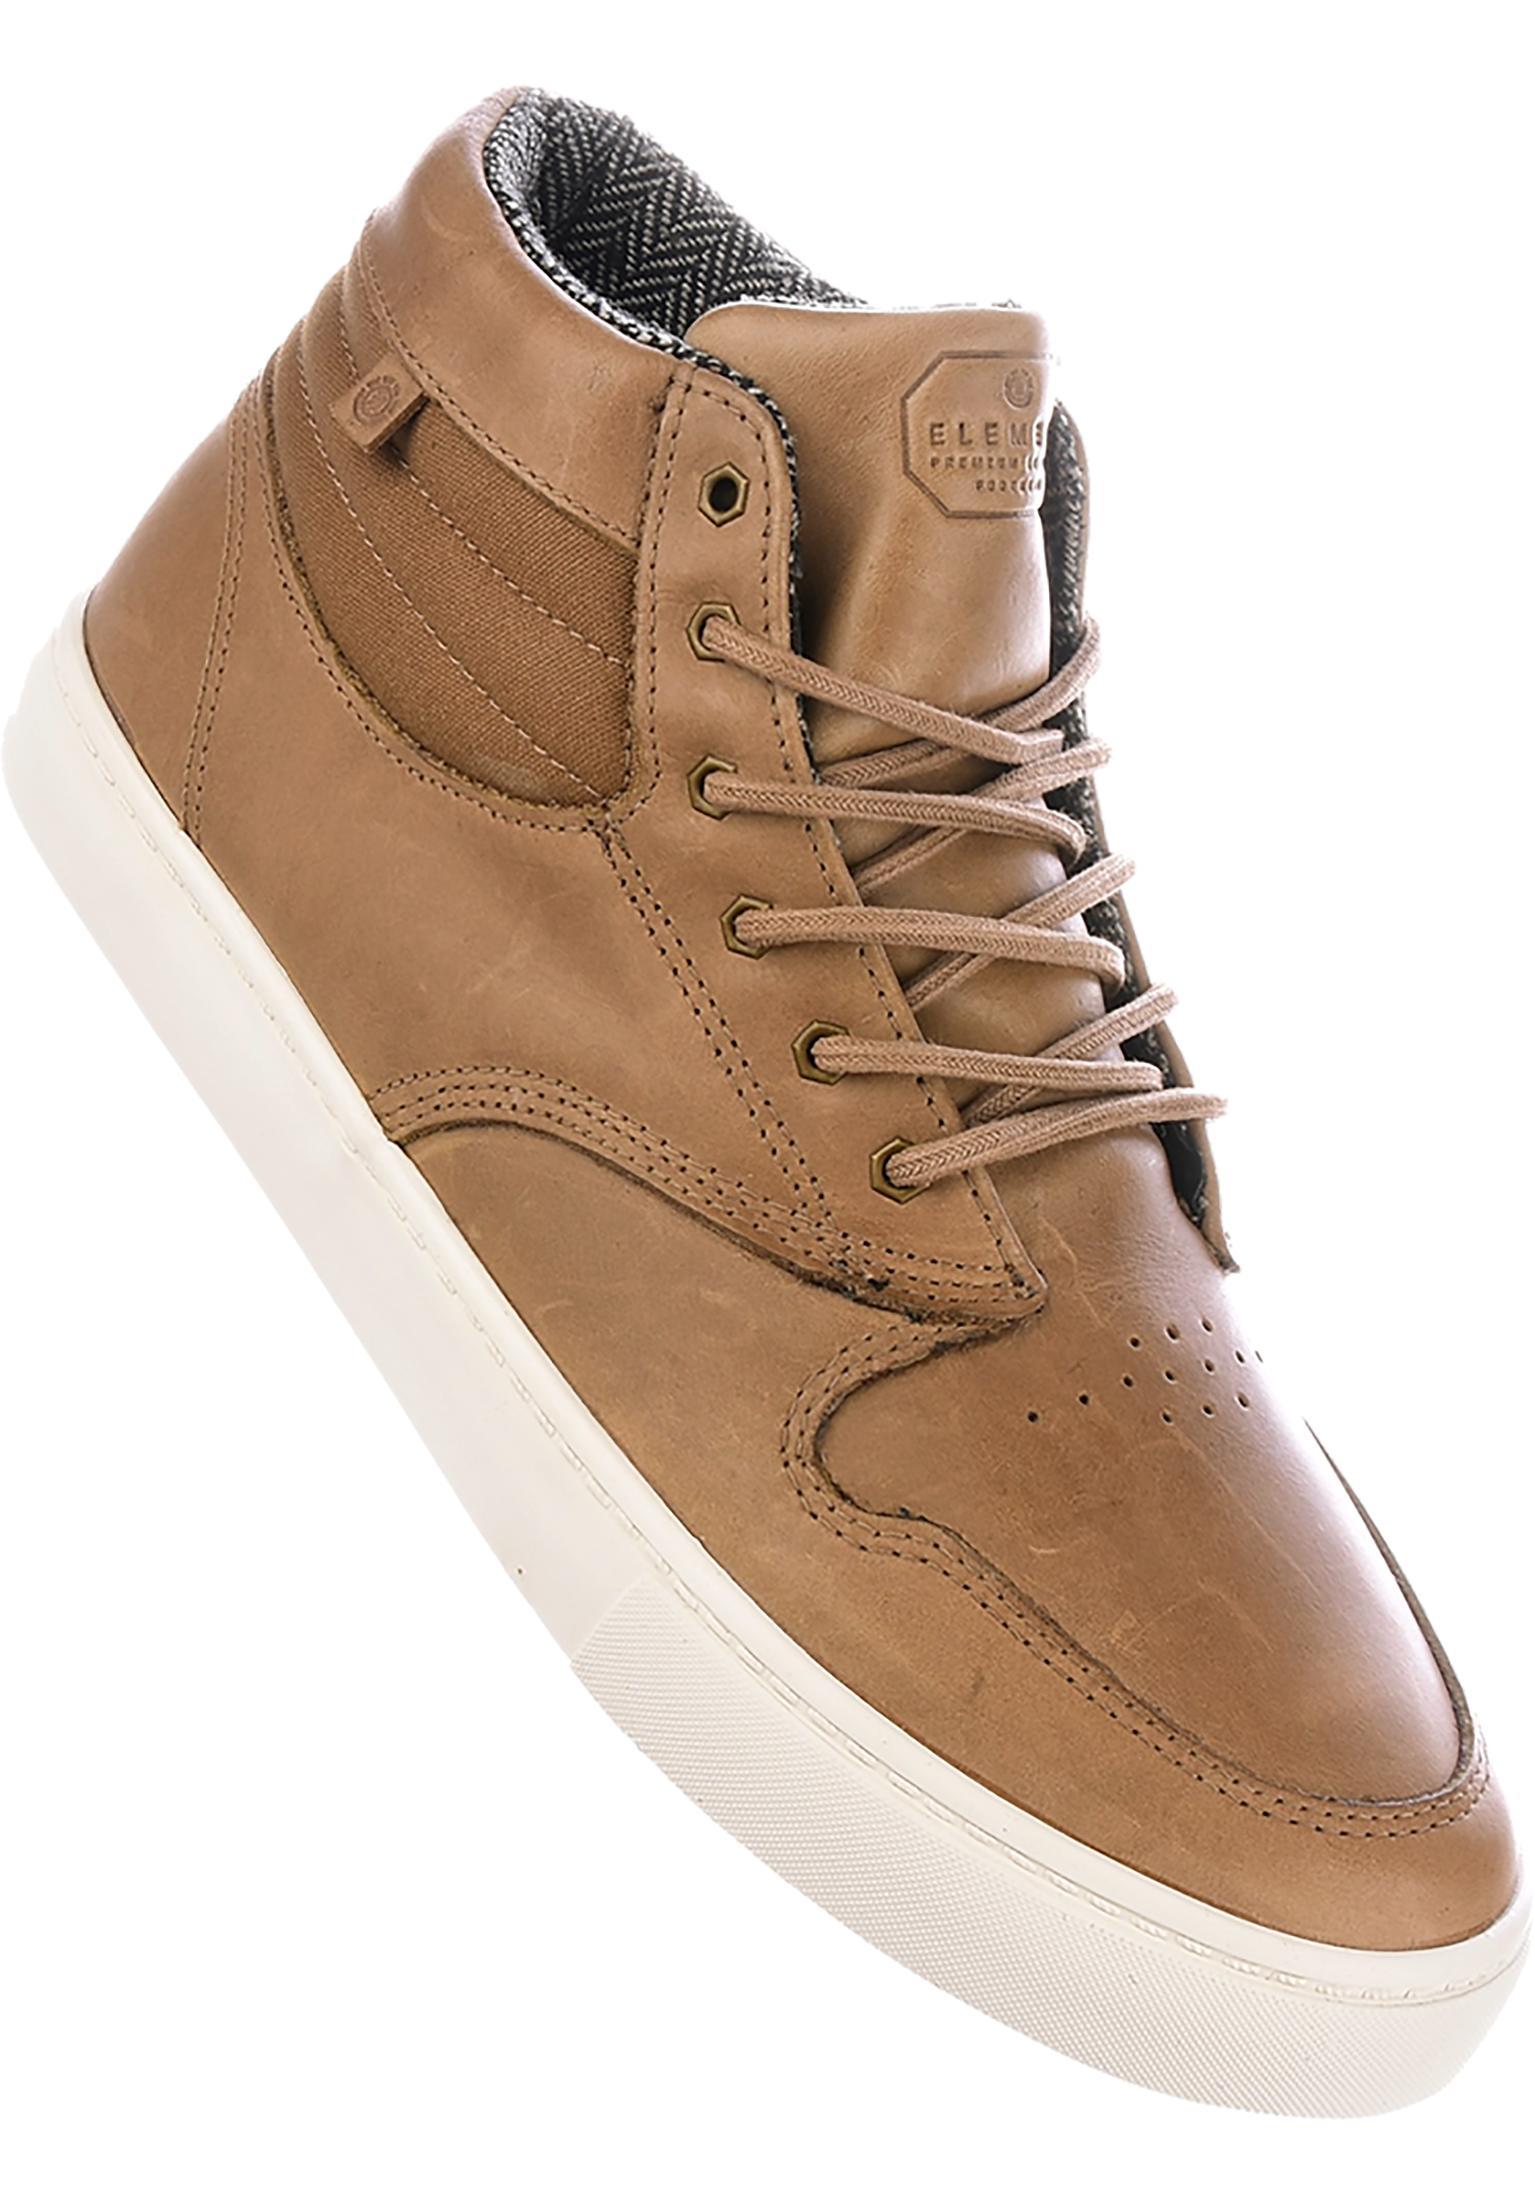 da Topaz Element Titus Tutte Mid premium walnut in Uomo le C3 scarpe zqFrwz